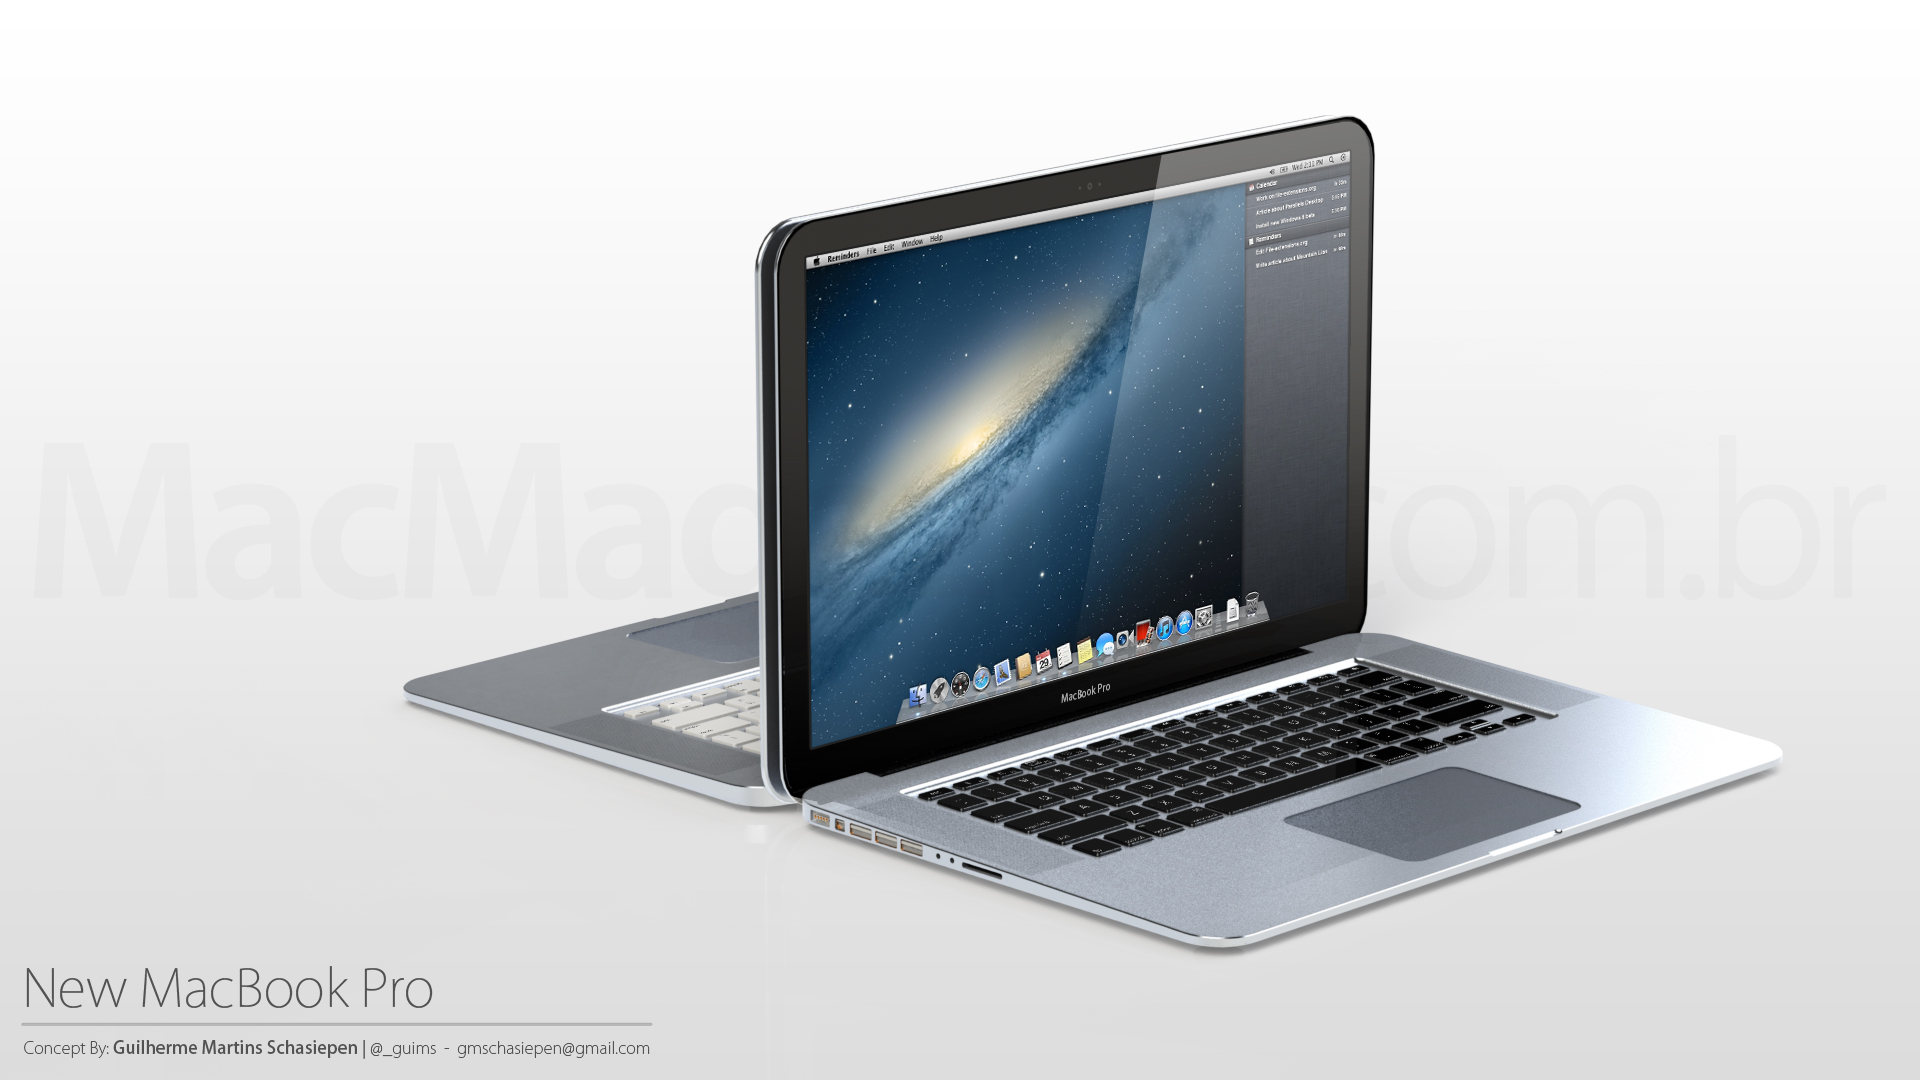 Conceito de novos MacBooks Pro - por Guilherme Schasiepen